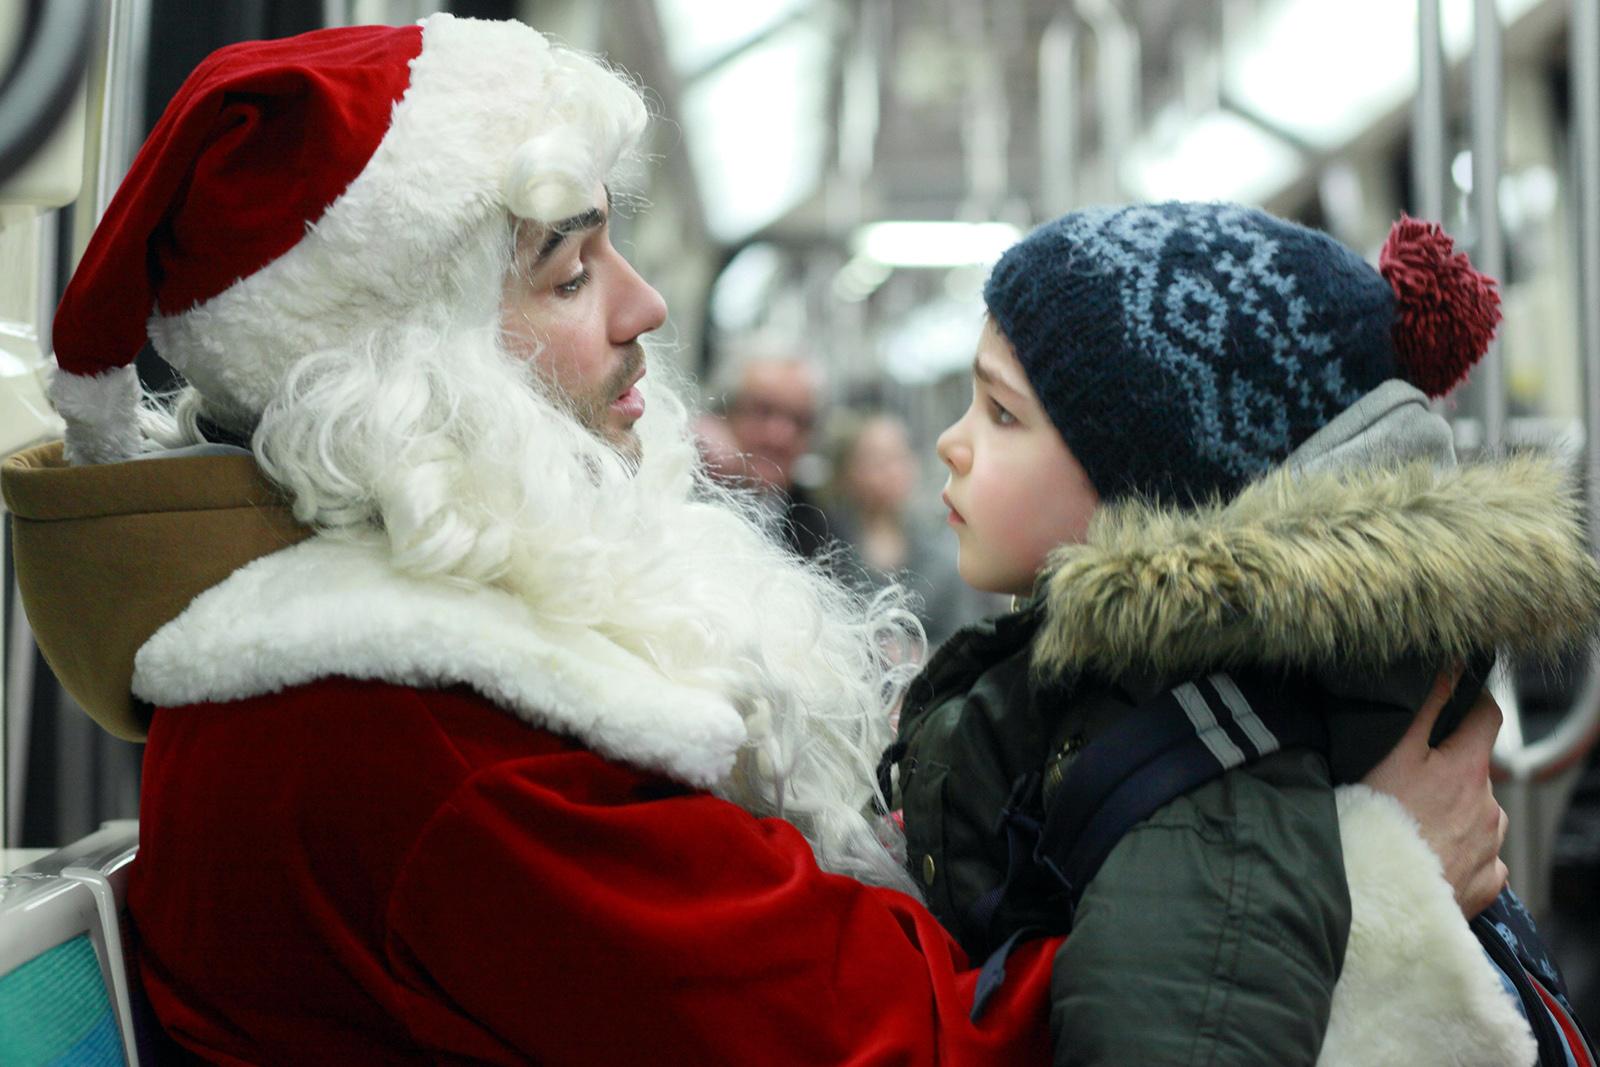 Film Streaming Le Père Noël Regarder Online